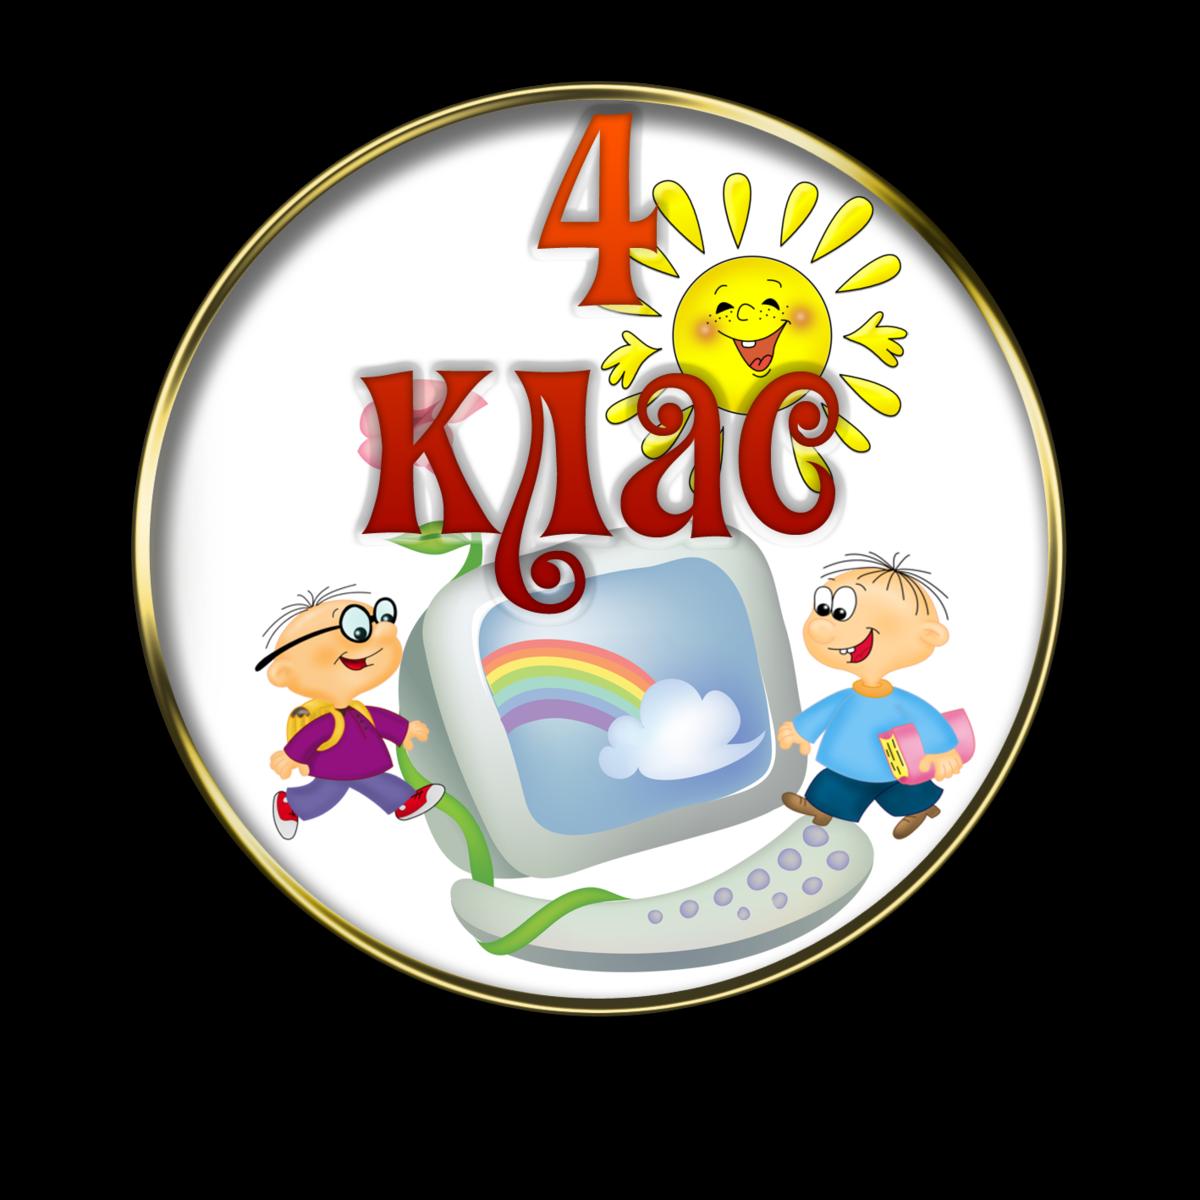 Картинка для логотипа класса